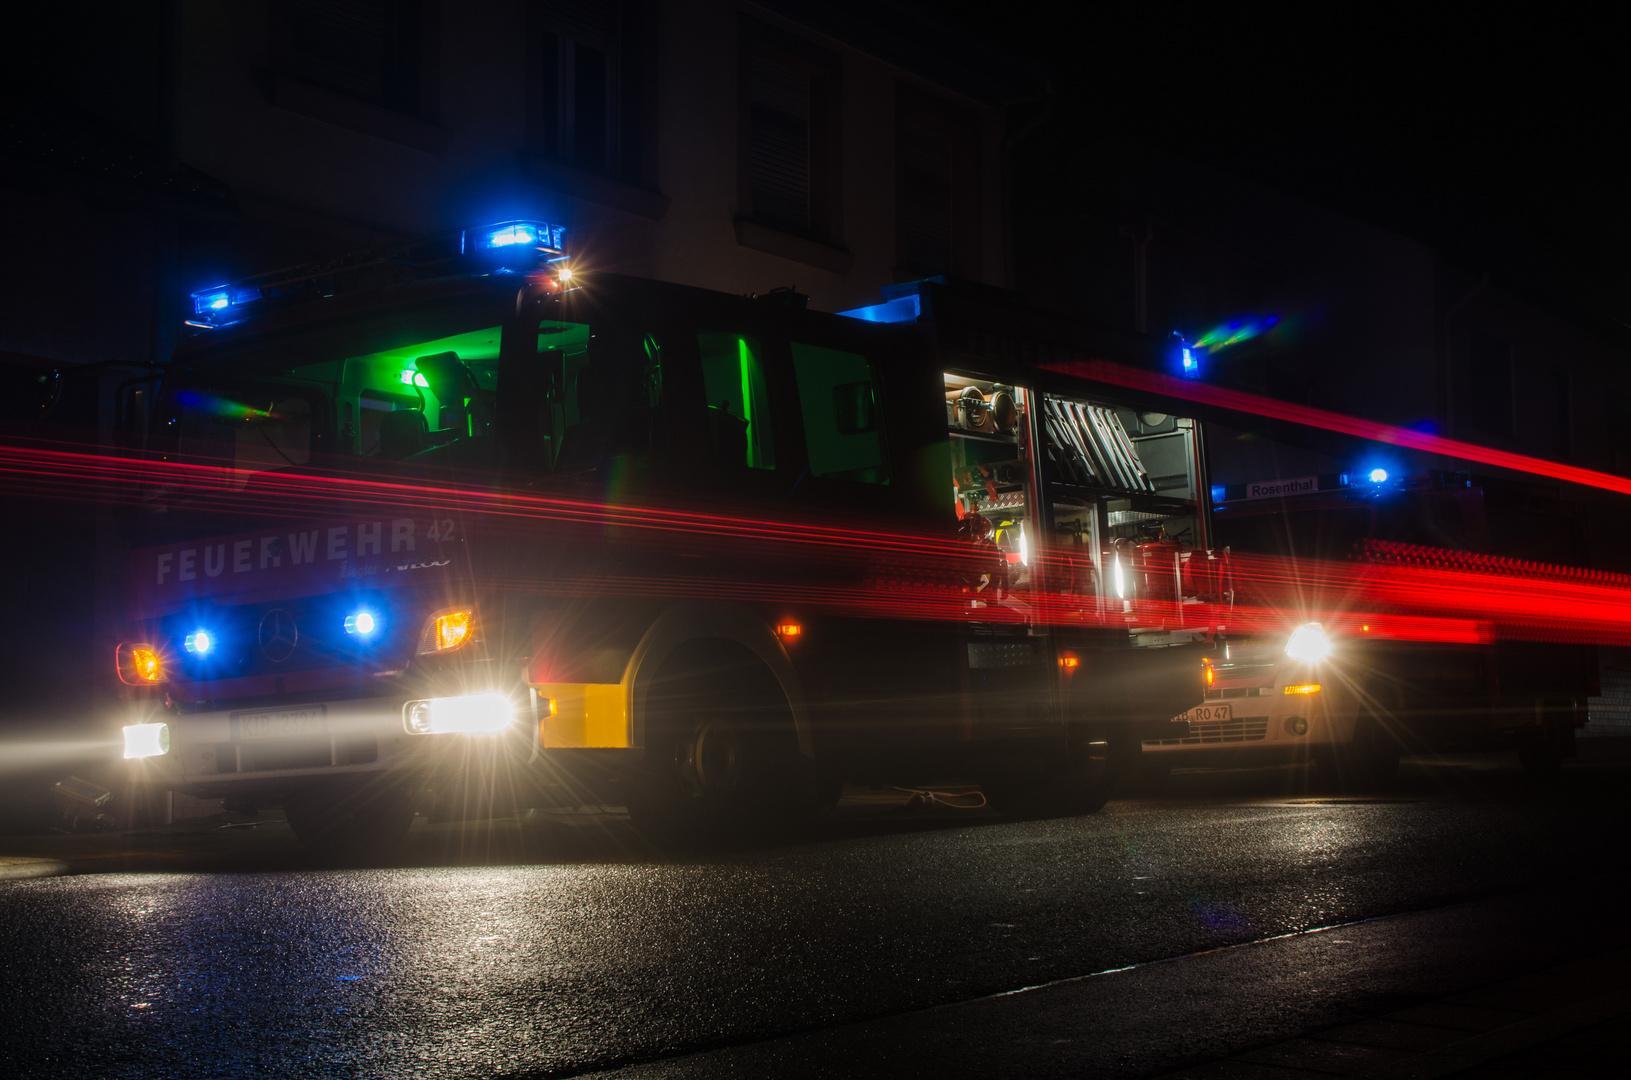 Feuerwehr Nightline I